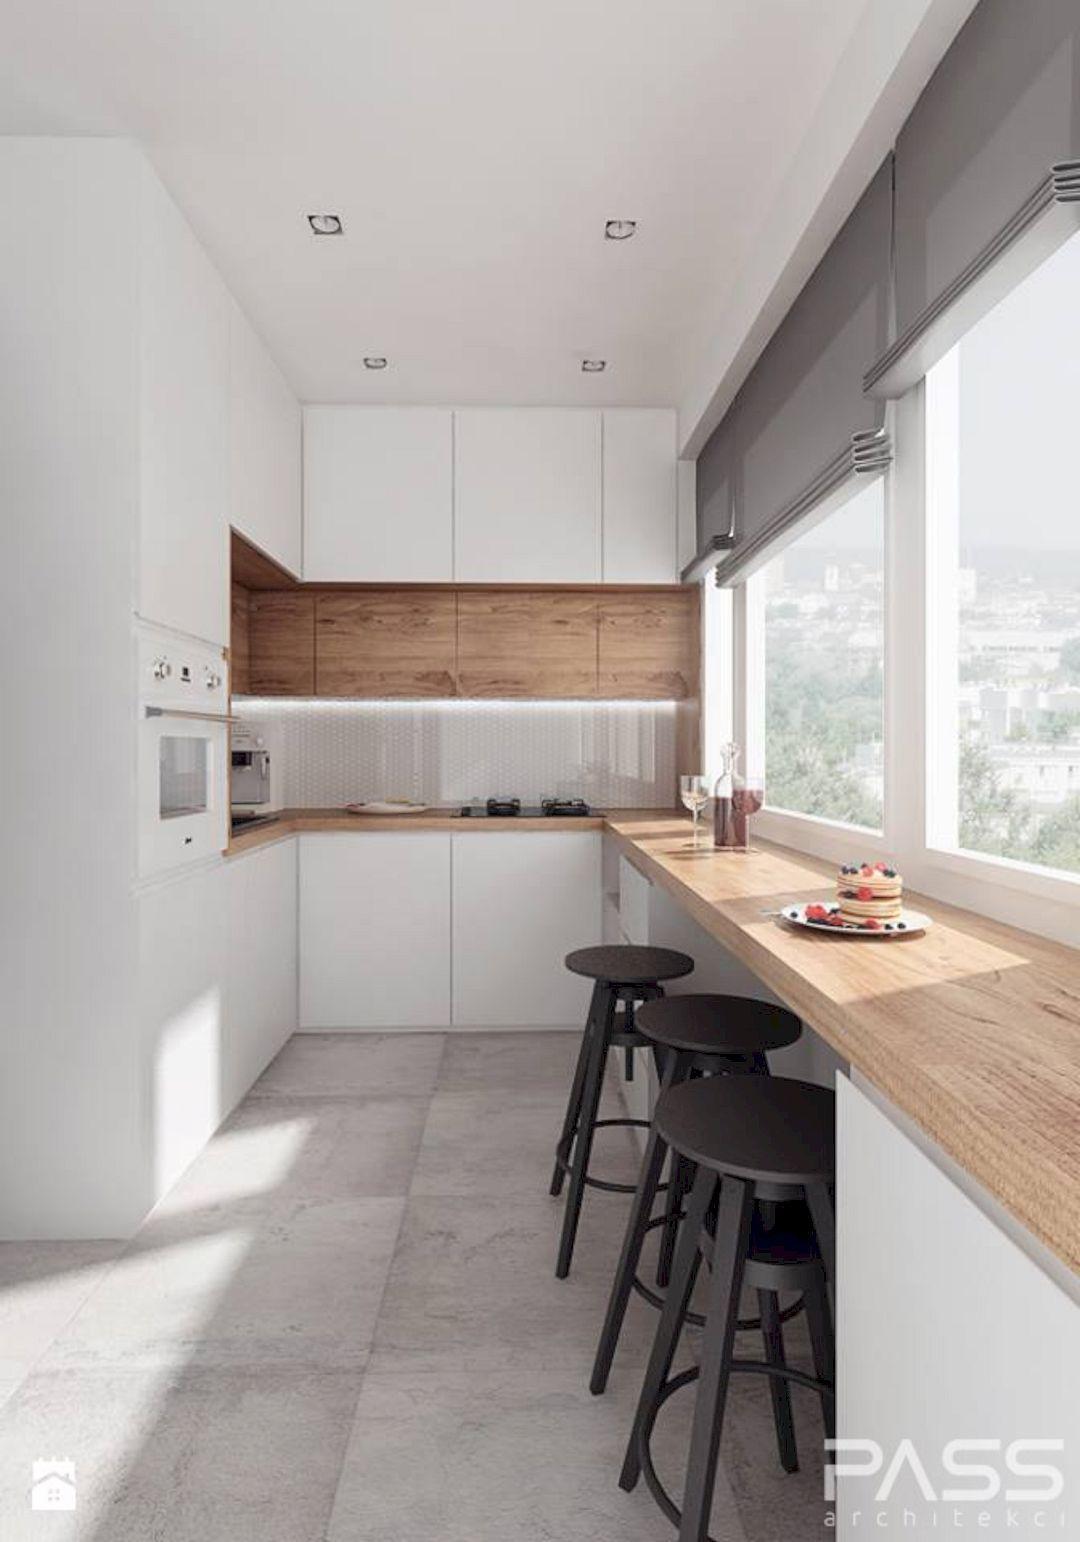 Amazing Small Kitchen Ideas For Small Space 100 | Pequeños, Espacios ...